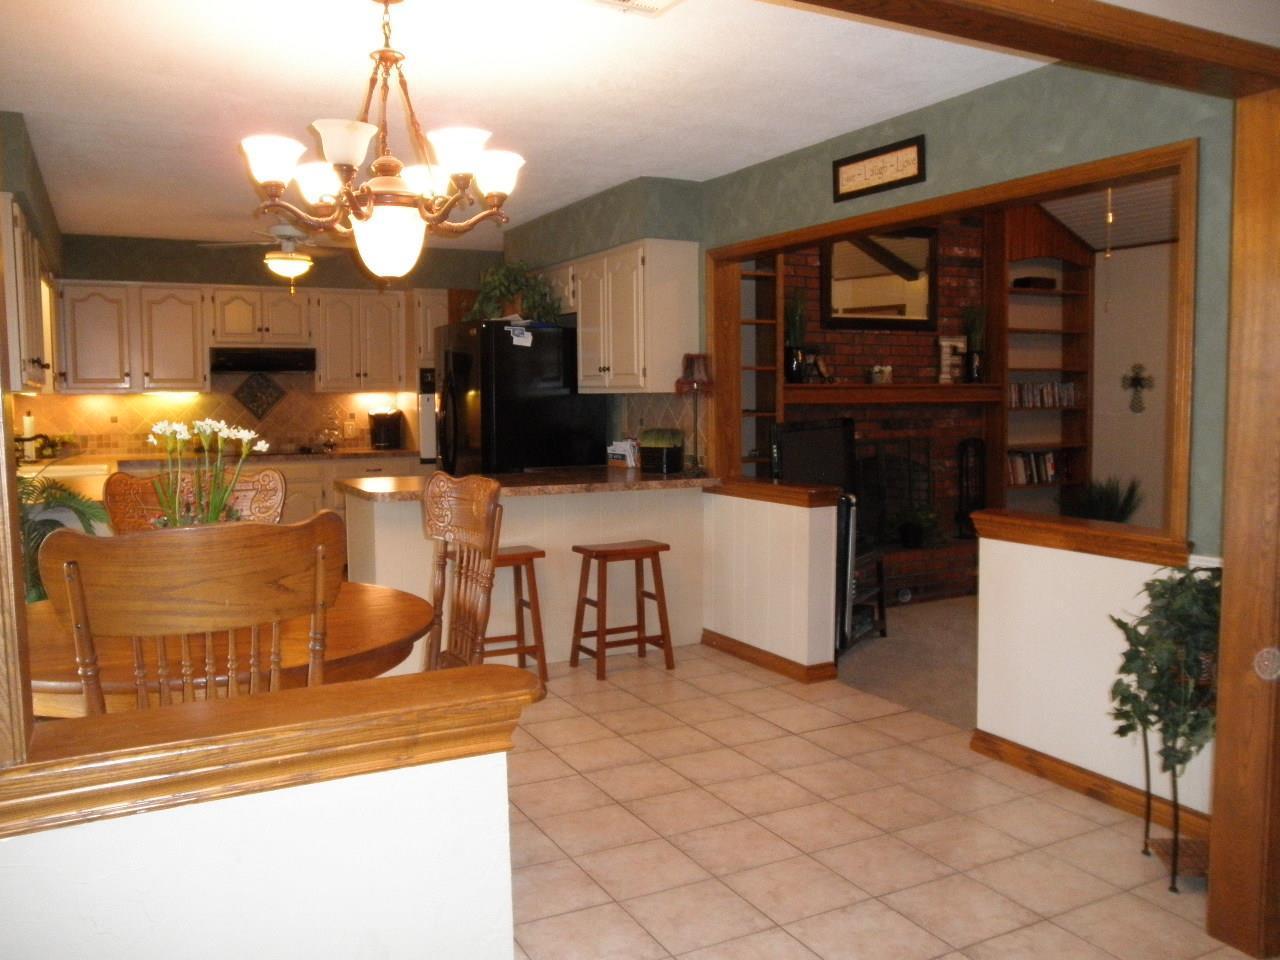 Sold Cross Sale W/ MLS | 2805 Ames  Ponca City, OK  13